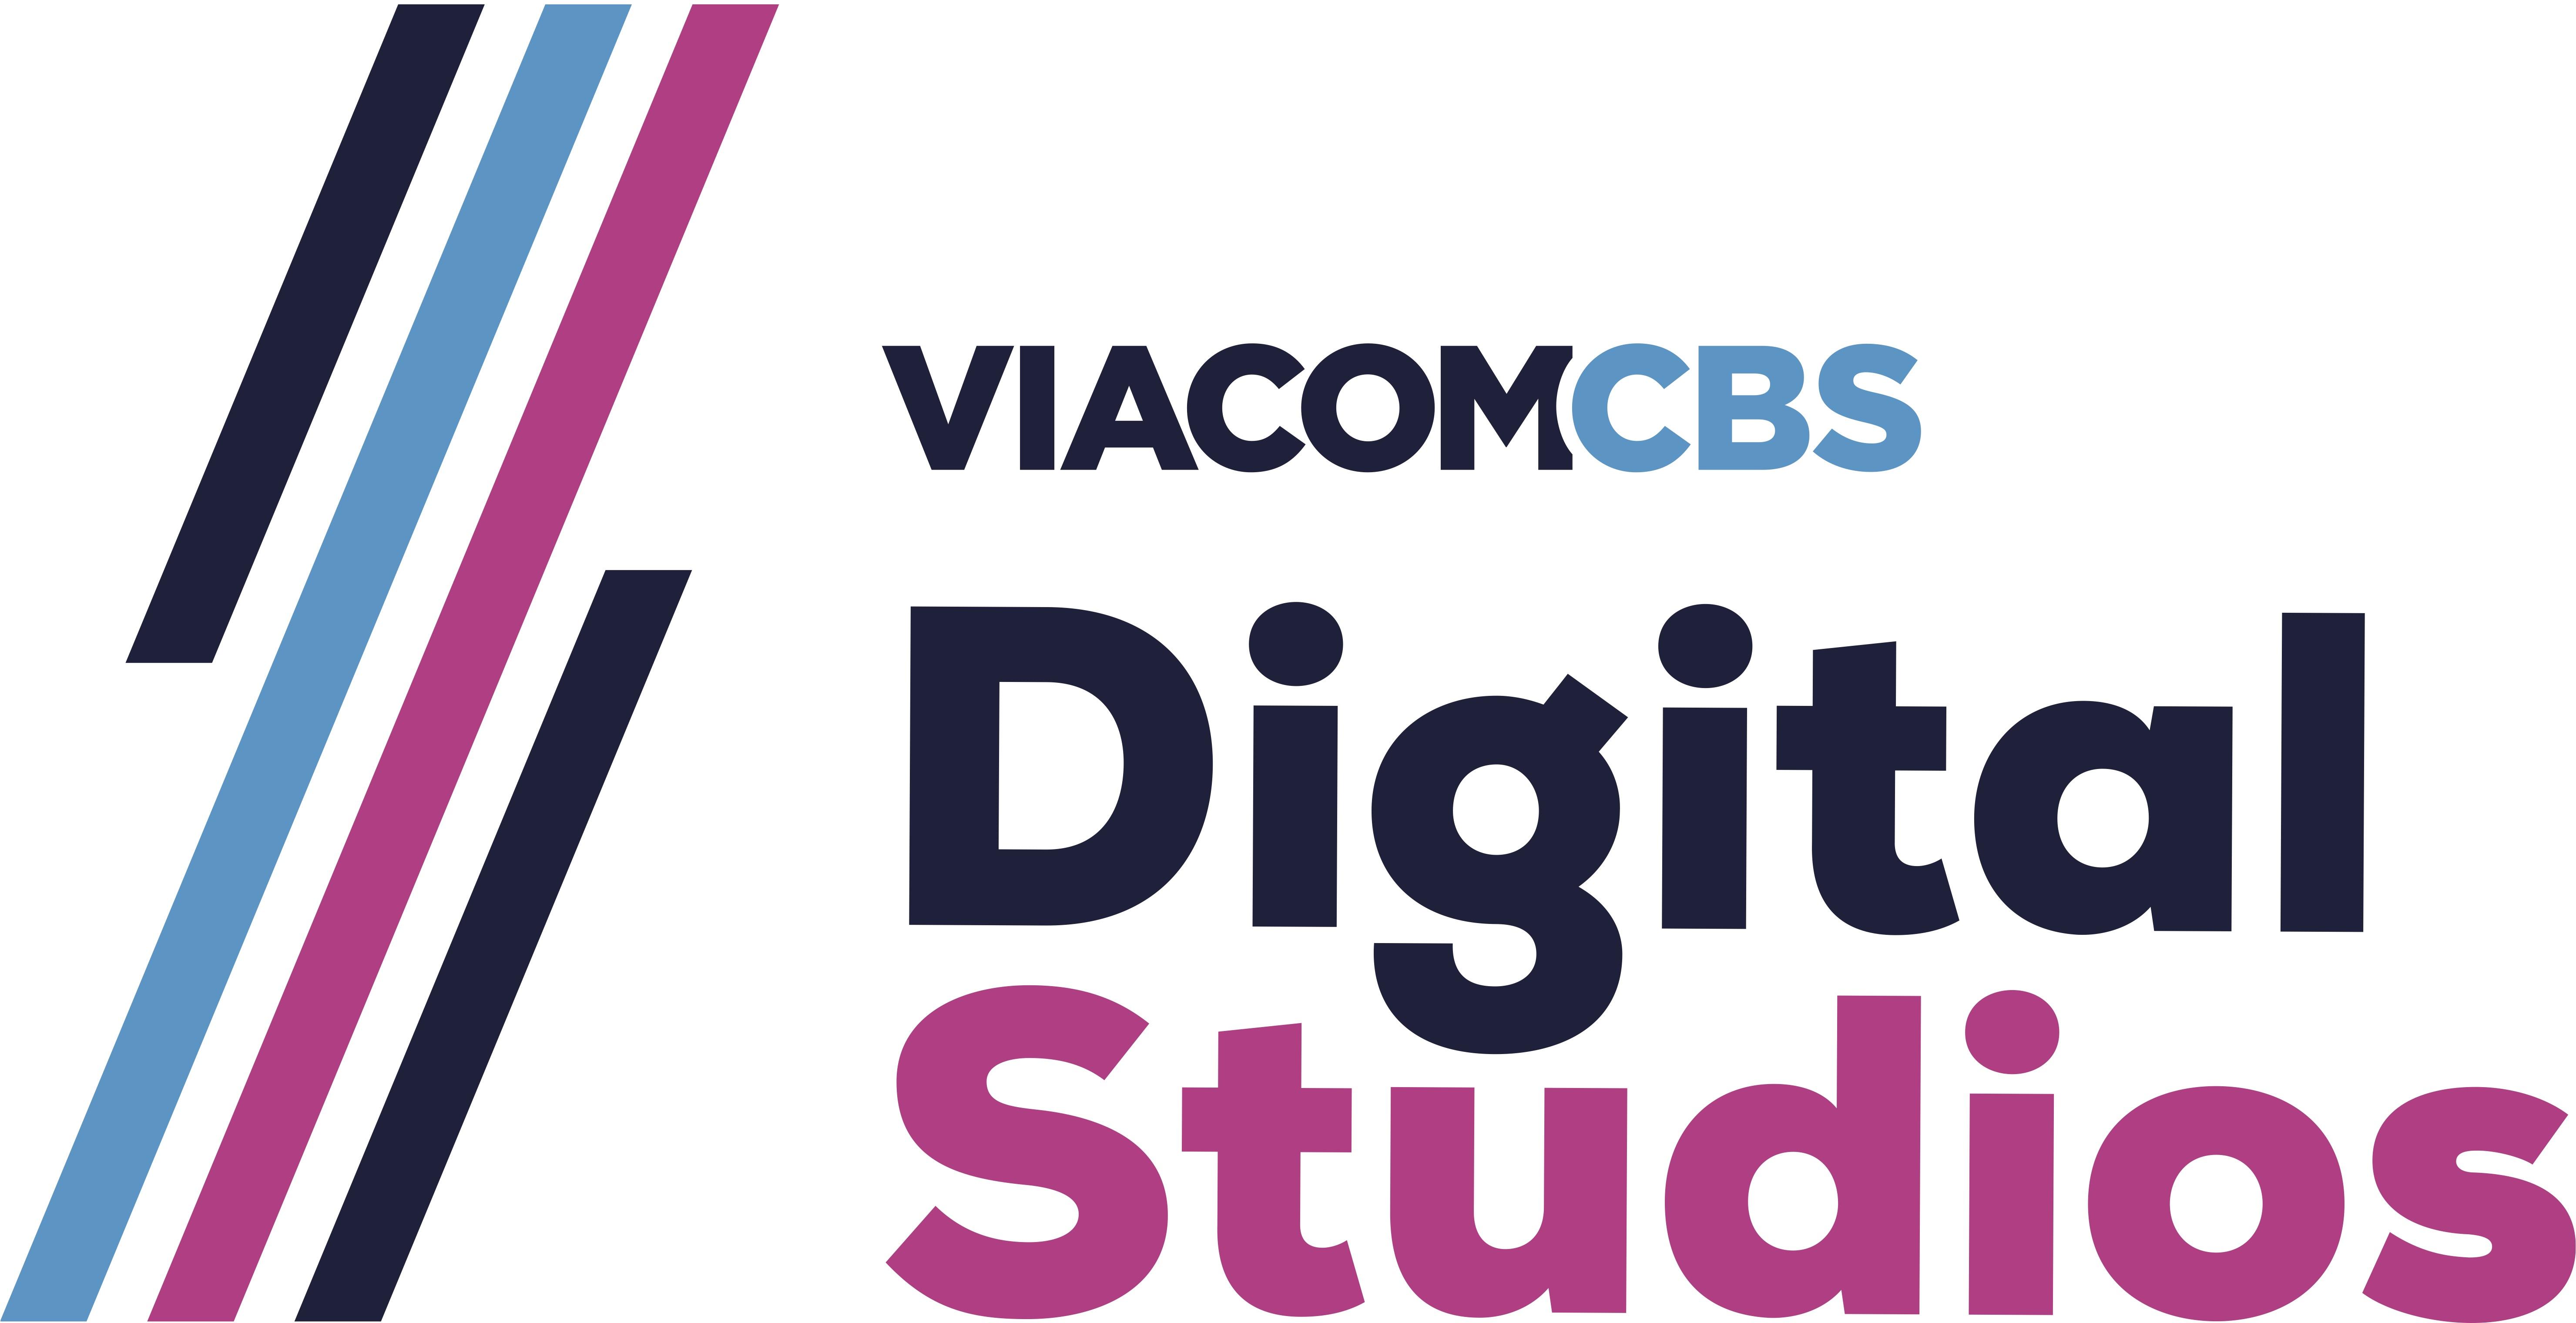 ViacomCBS Digital Studios